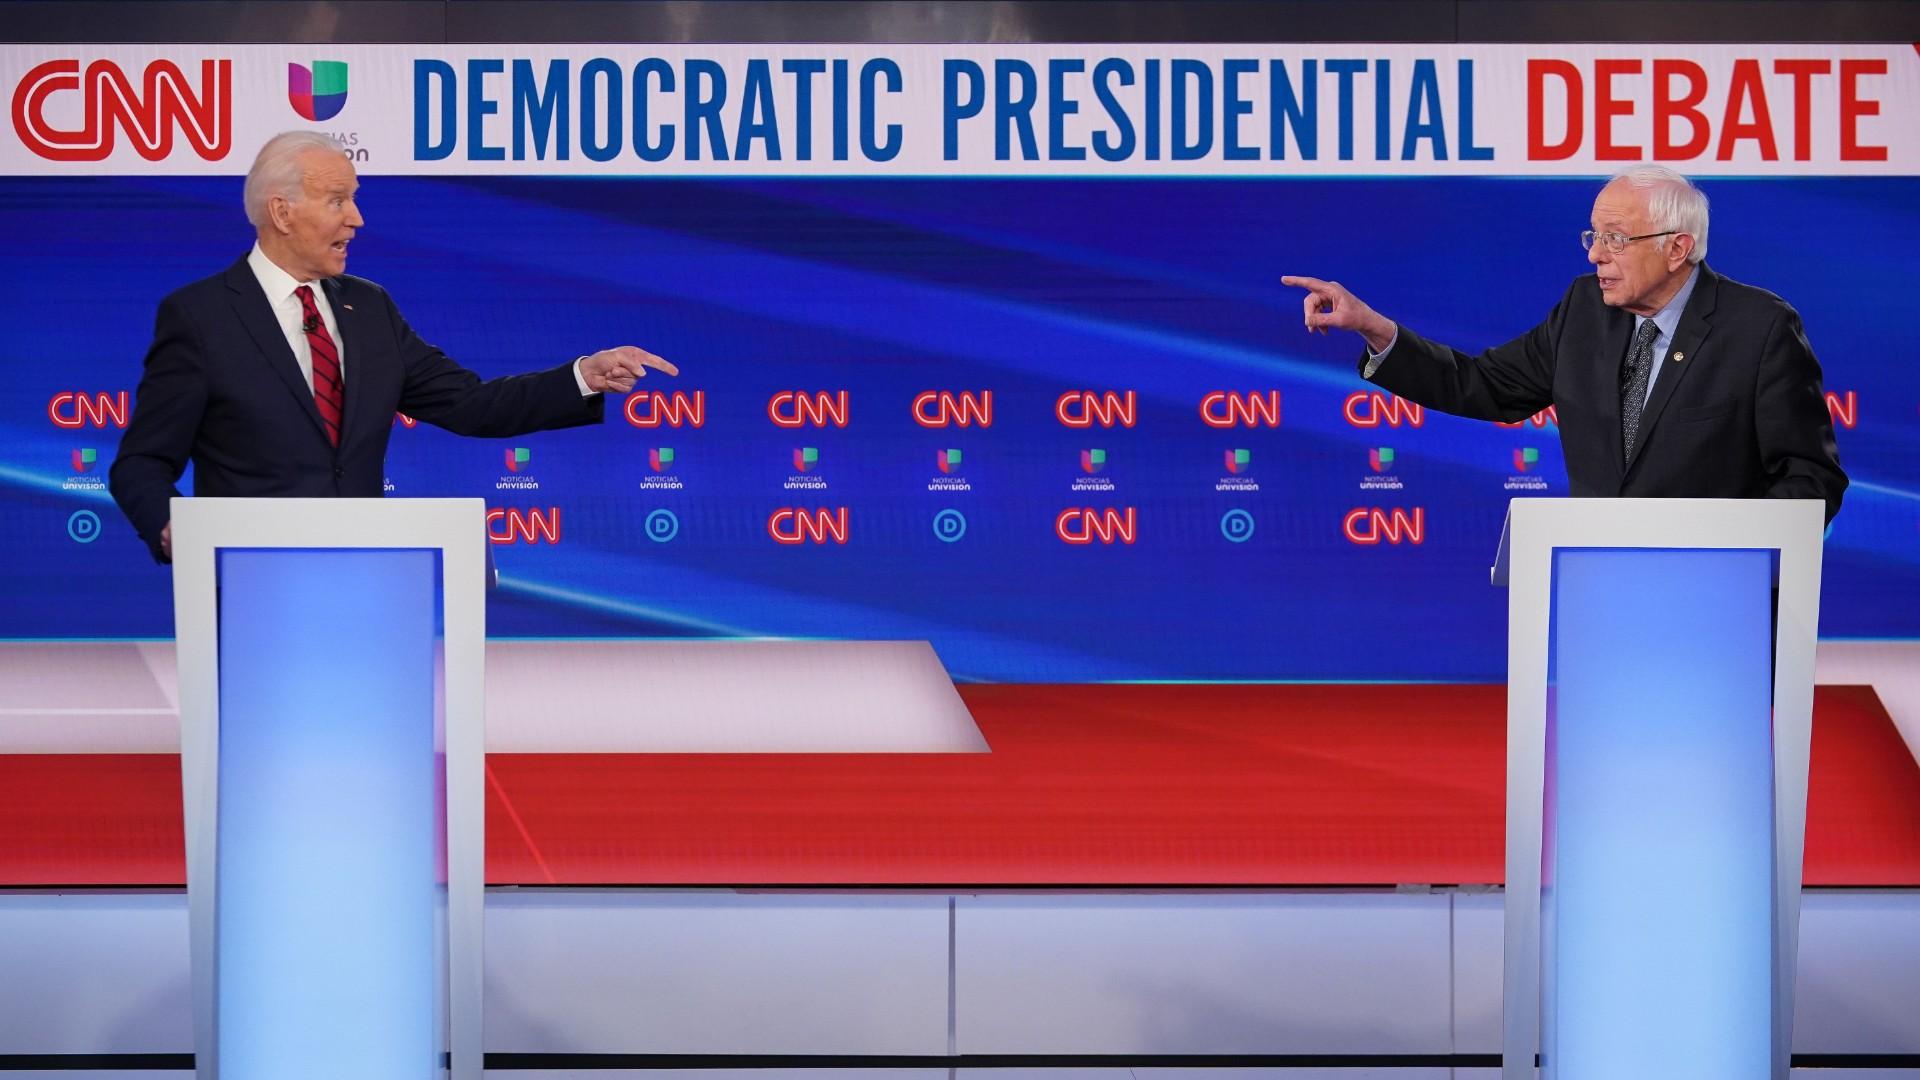 Democratic presidential hopefuls former US vice president Joe Biden (L) and Vermont Senator Bernie Sanders (R) take part in the 11th Democratic Party 2020 presidential debate in a CNN Washington Bureau studio in Washington, DC on March 15, 2020. (Mandel Ngan/AFP/Getty Images)